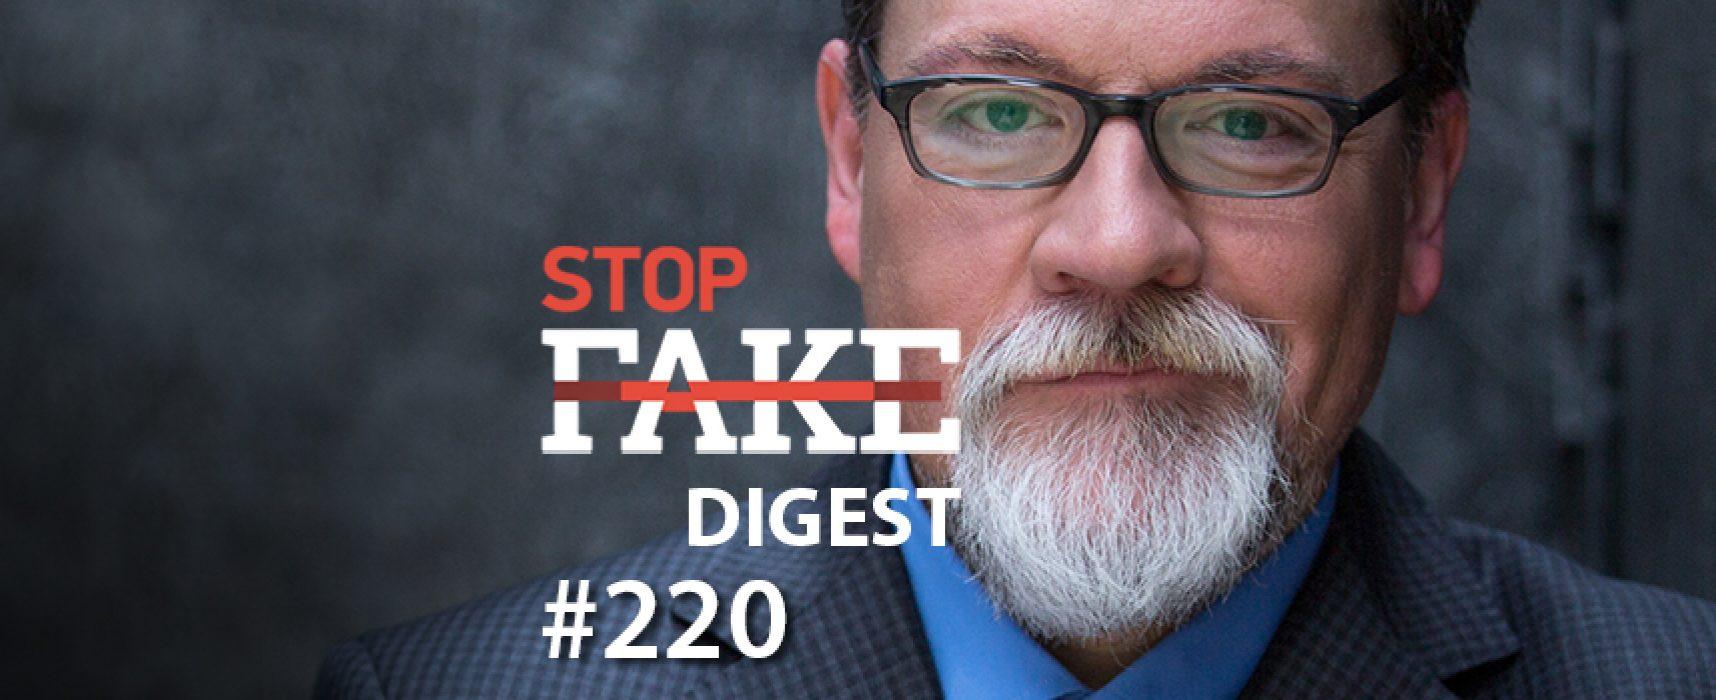 StopFake #220 with Marko Suprun